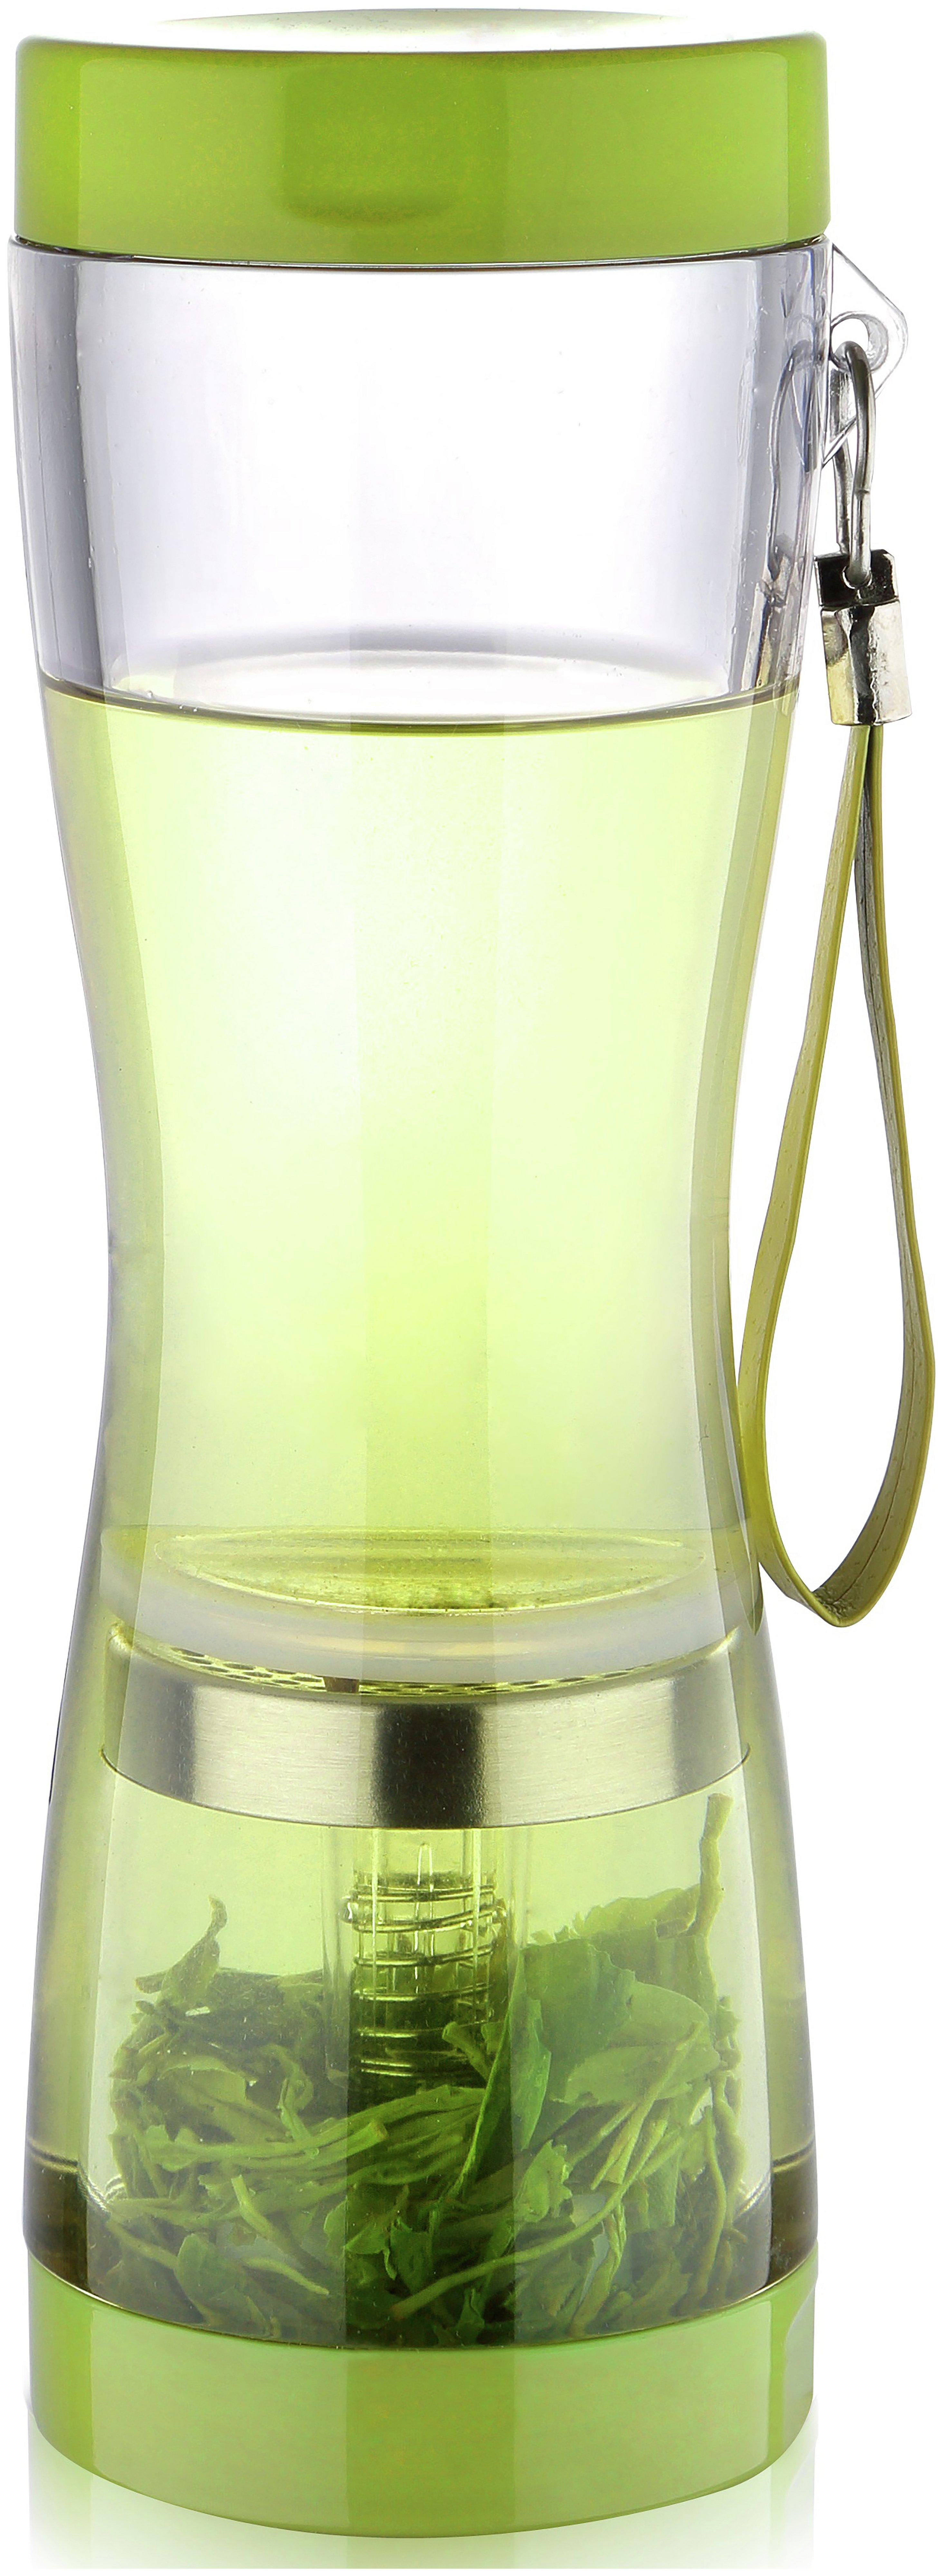 Image of Chef Sauce Glass Tea Bottle.